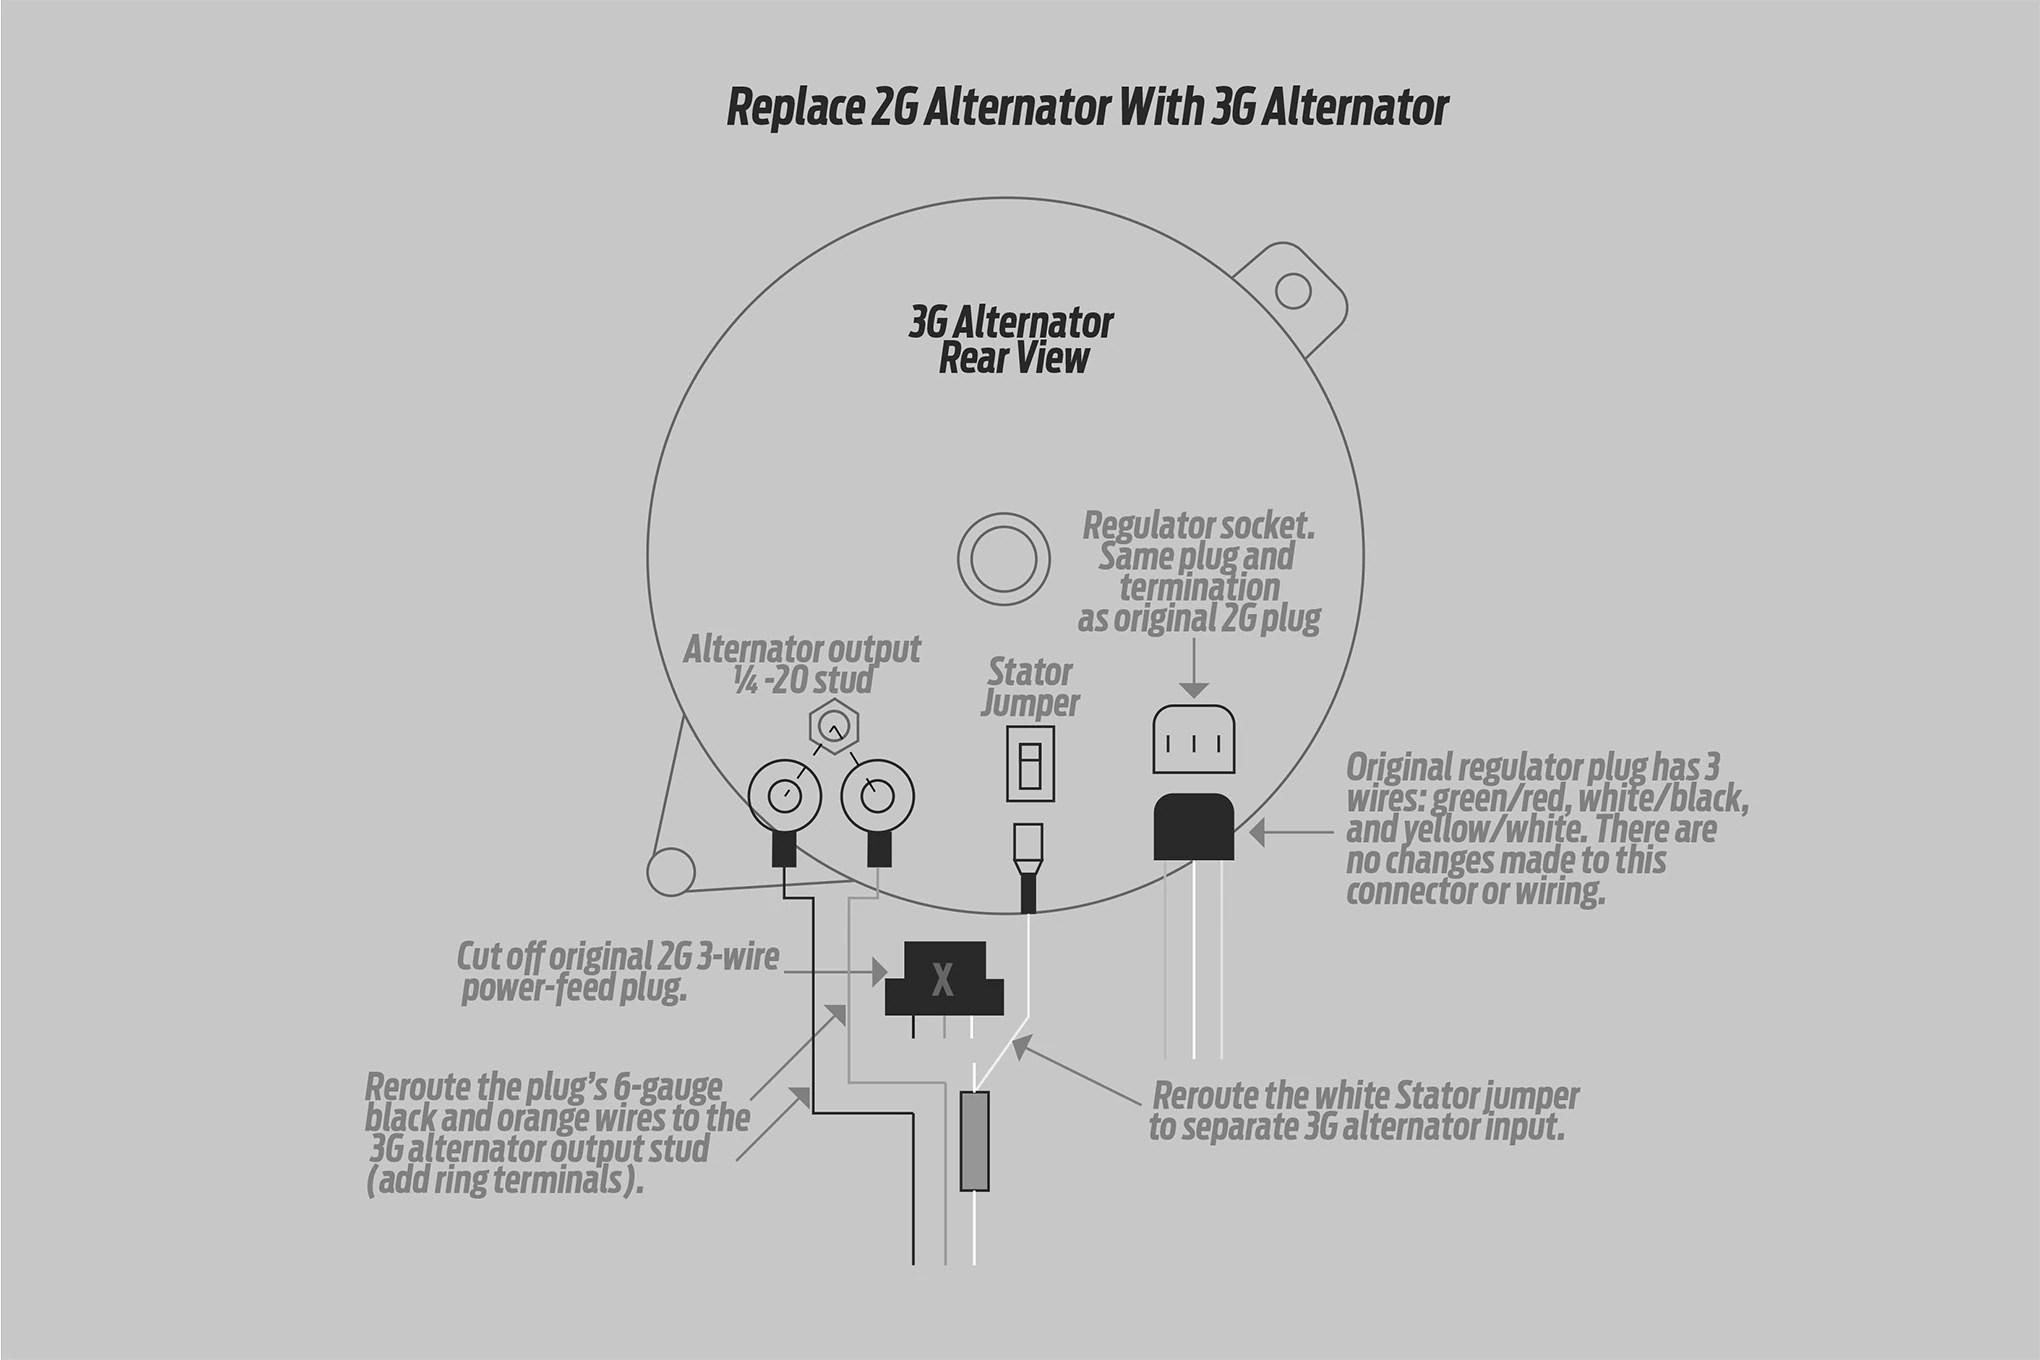 hight resolution of ron francis alternator wiring also ford 2g alternator wiring harness wiring diagram go